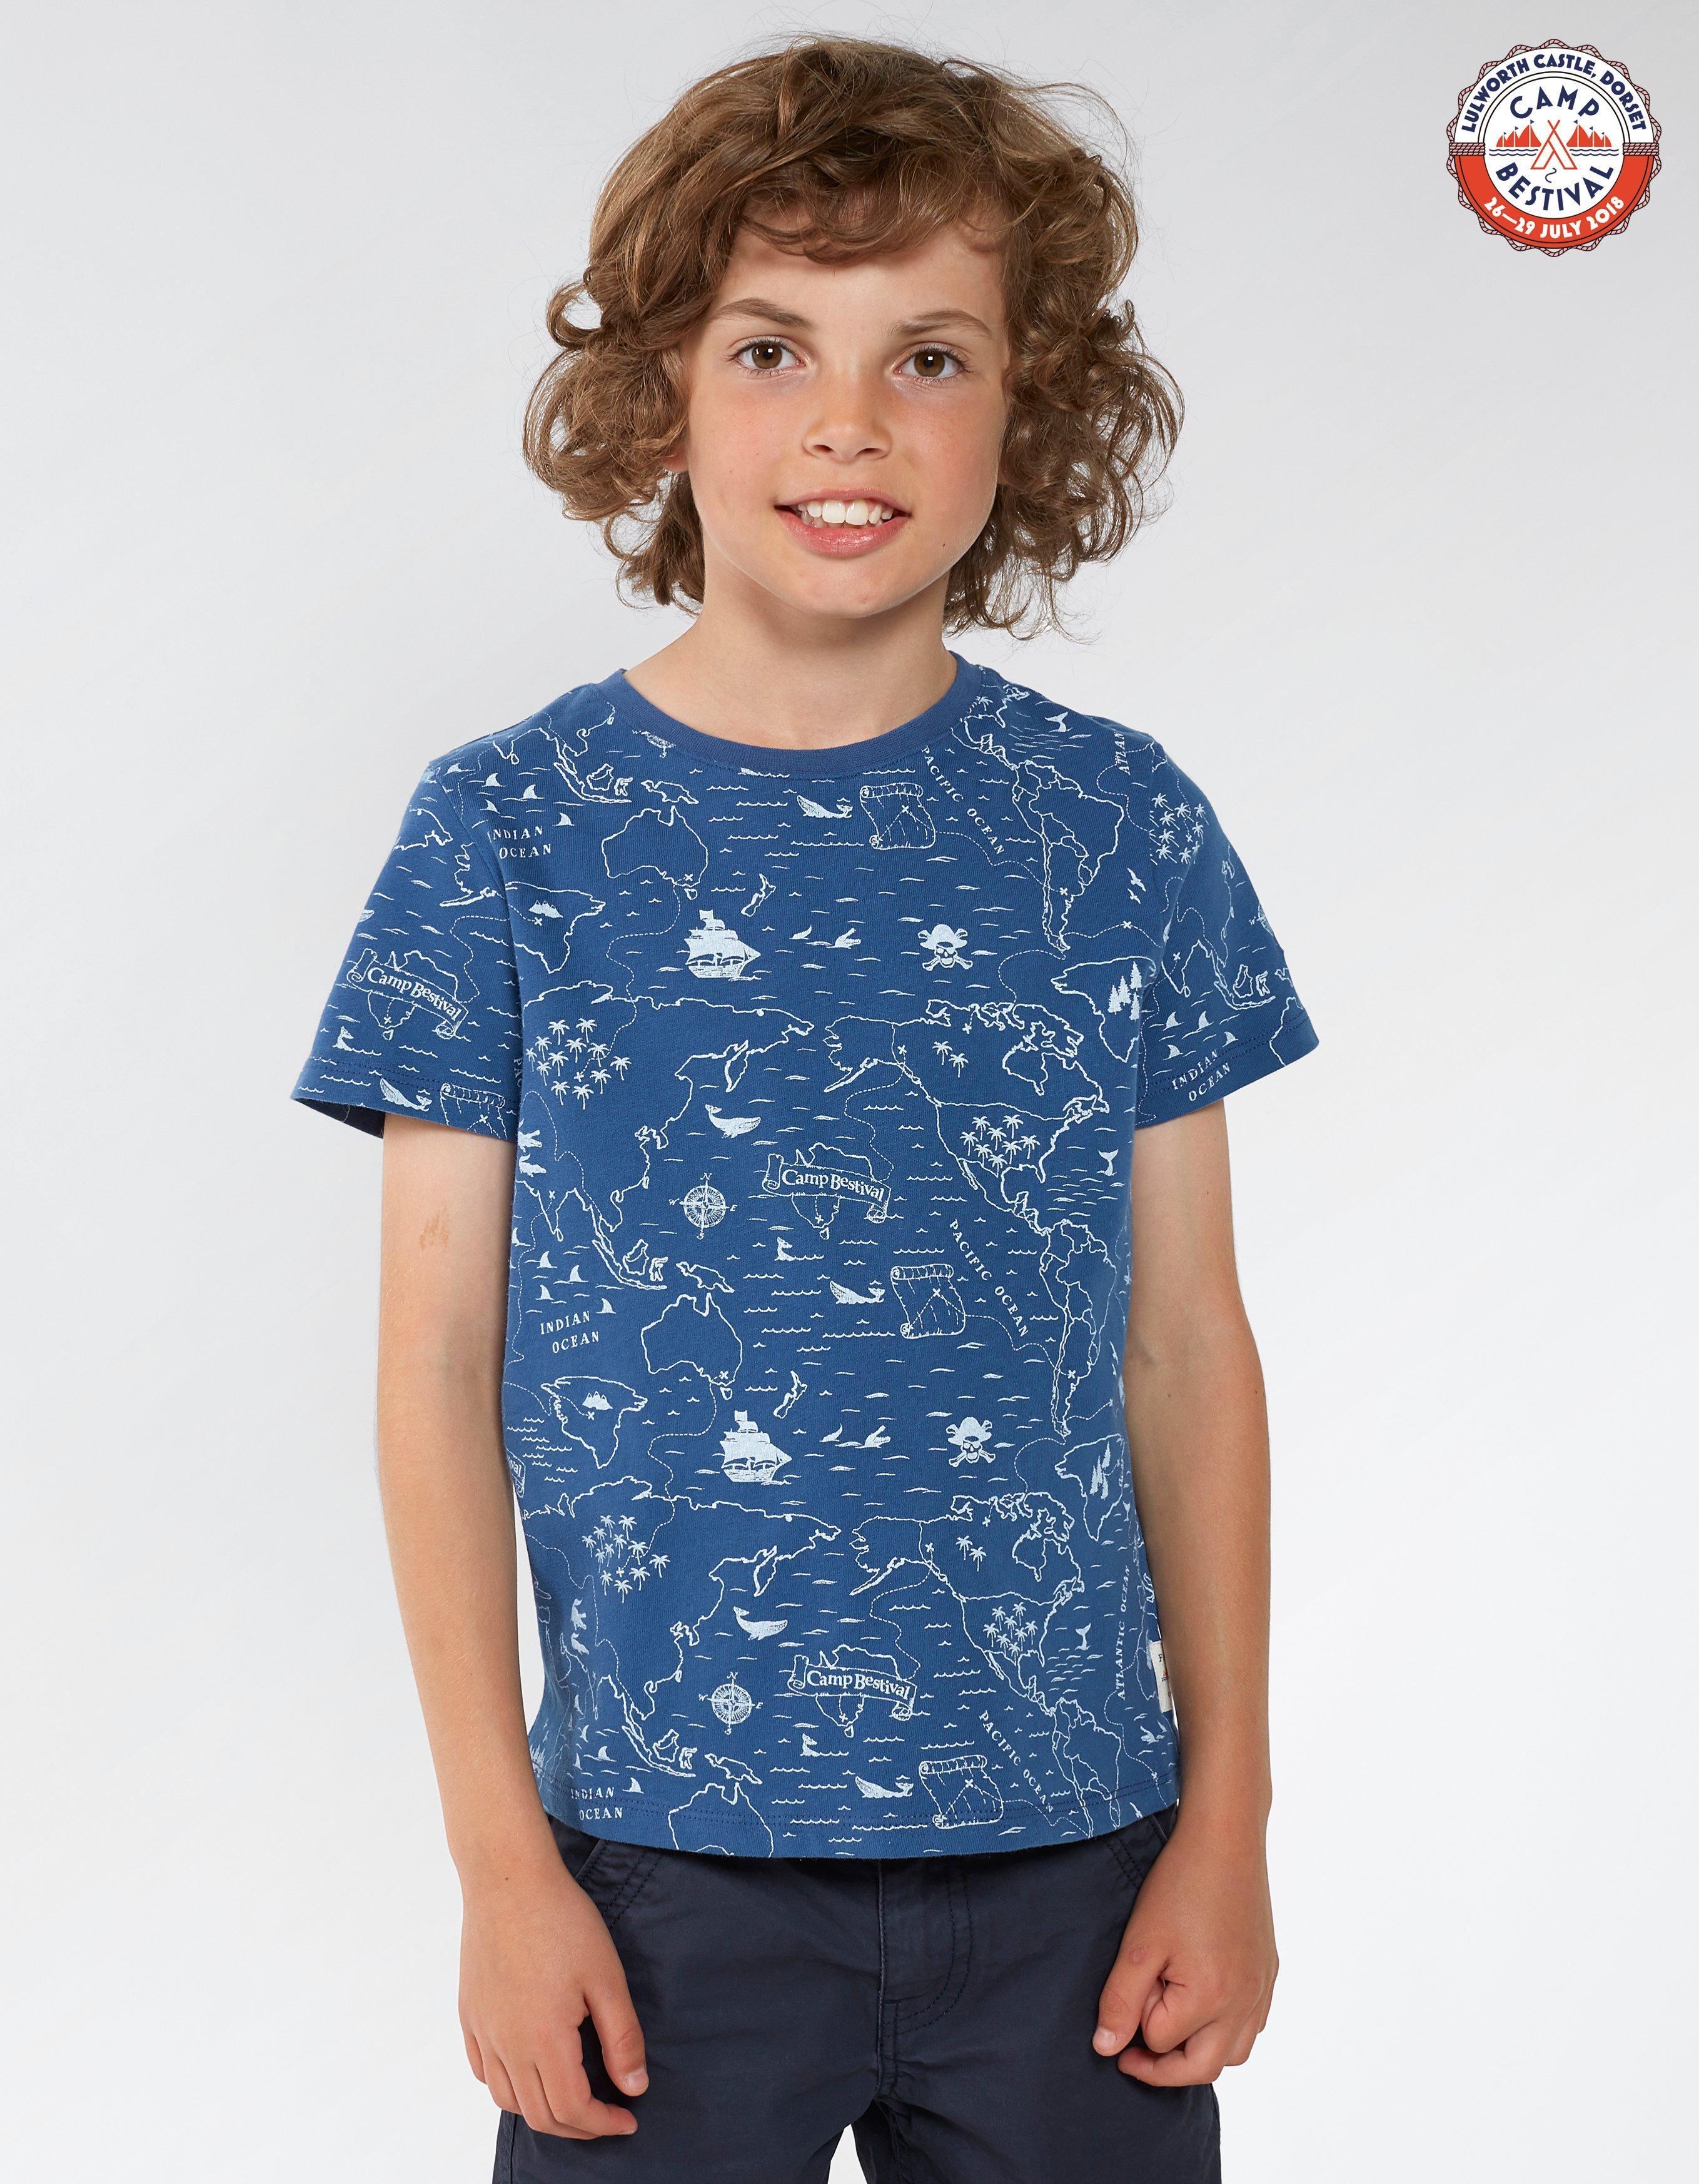 Camp Bestival Map T-Shirt